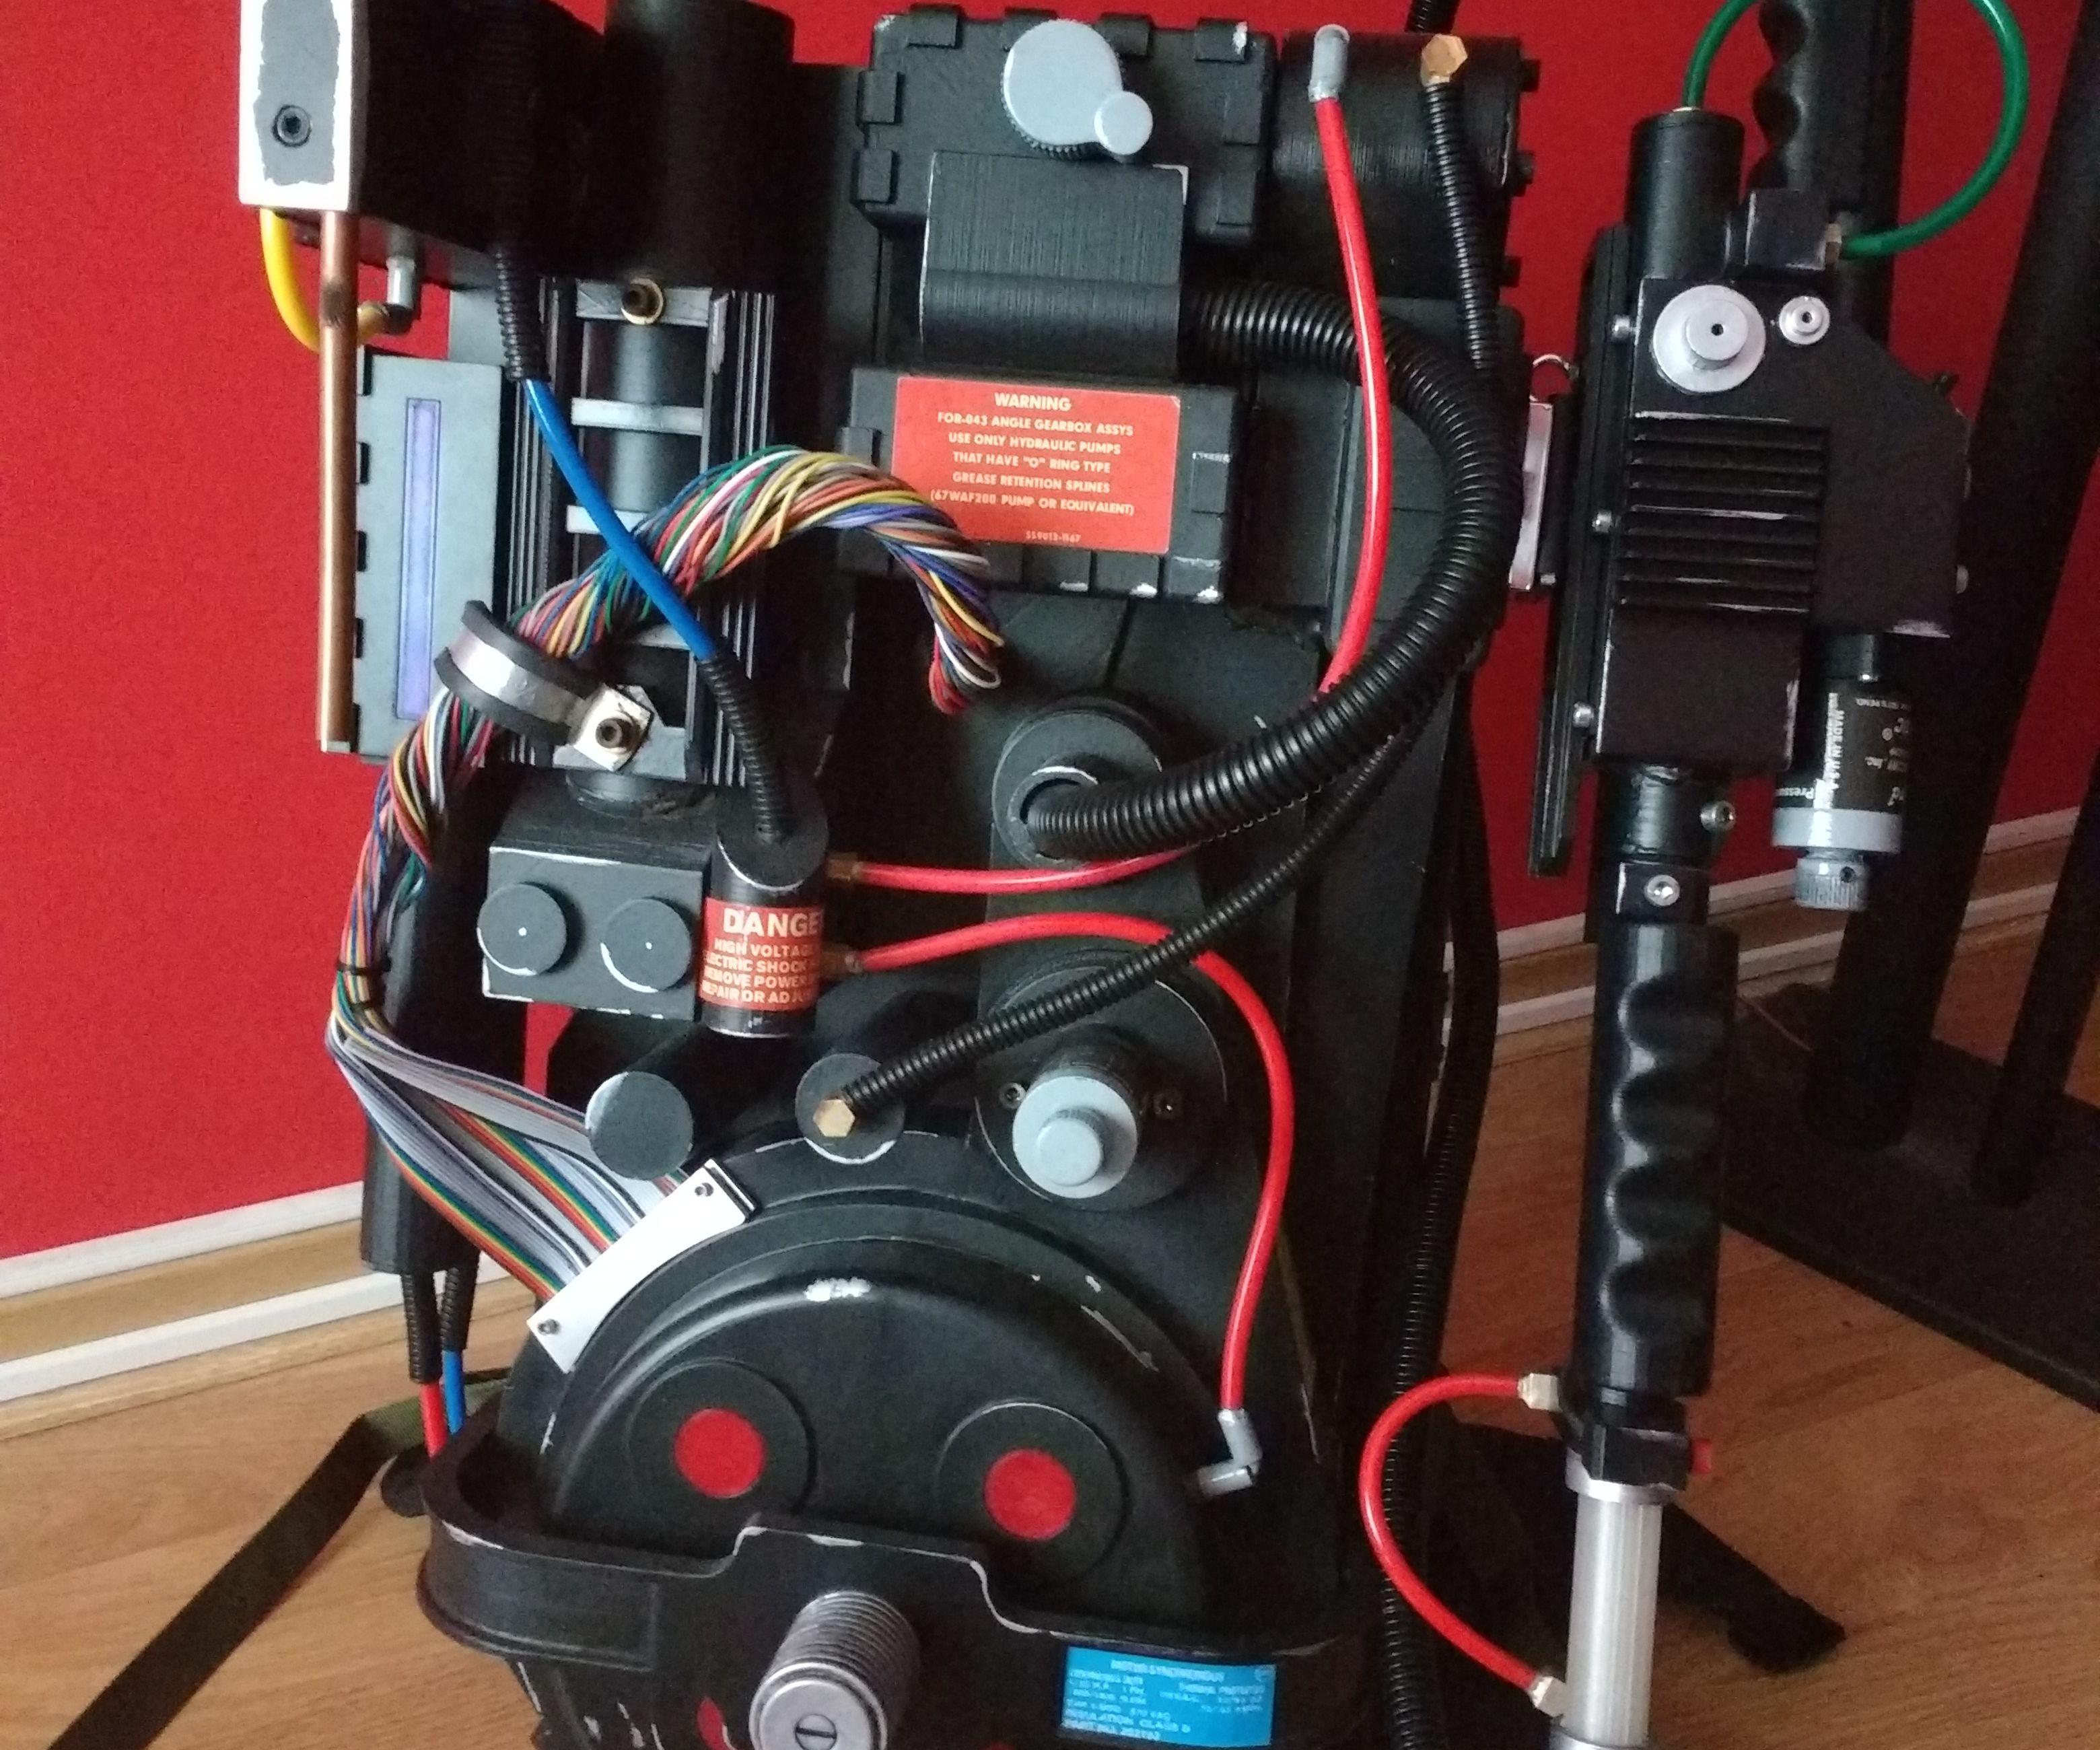 3D Printed Proton Pack